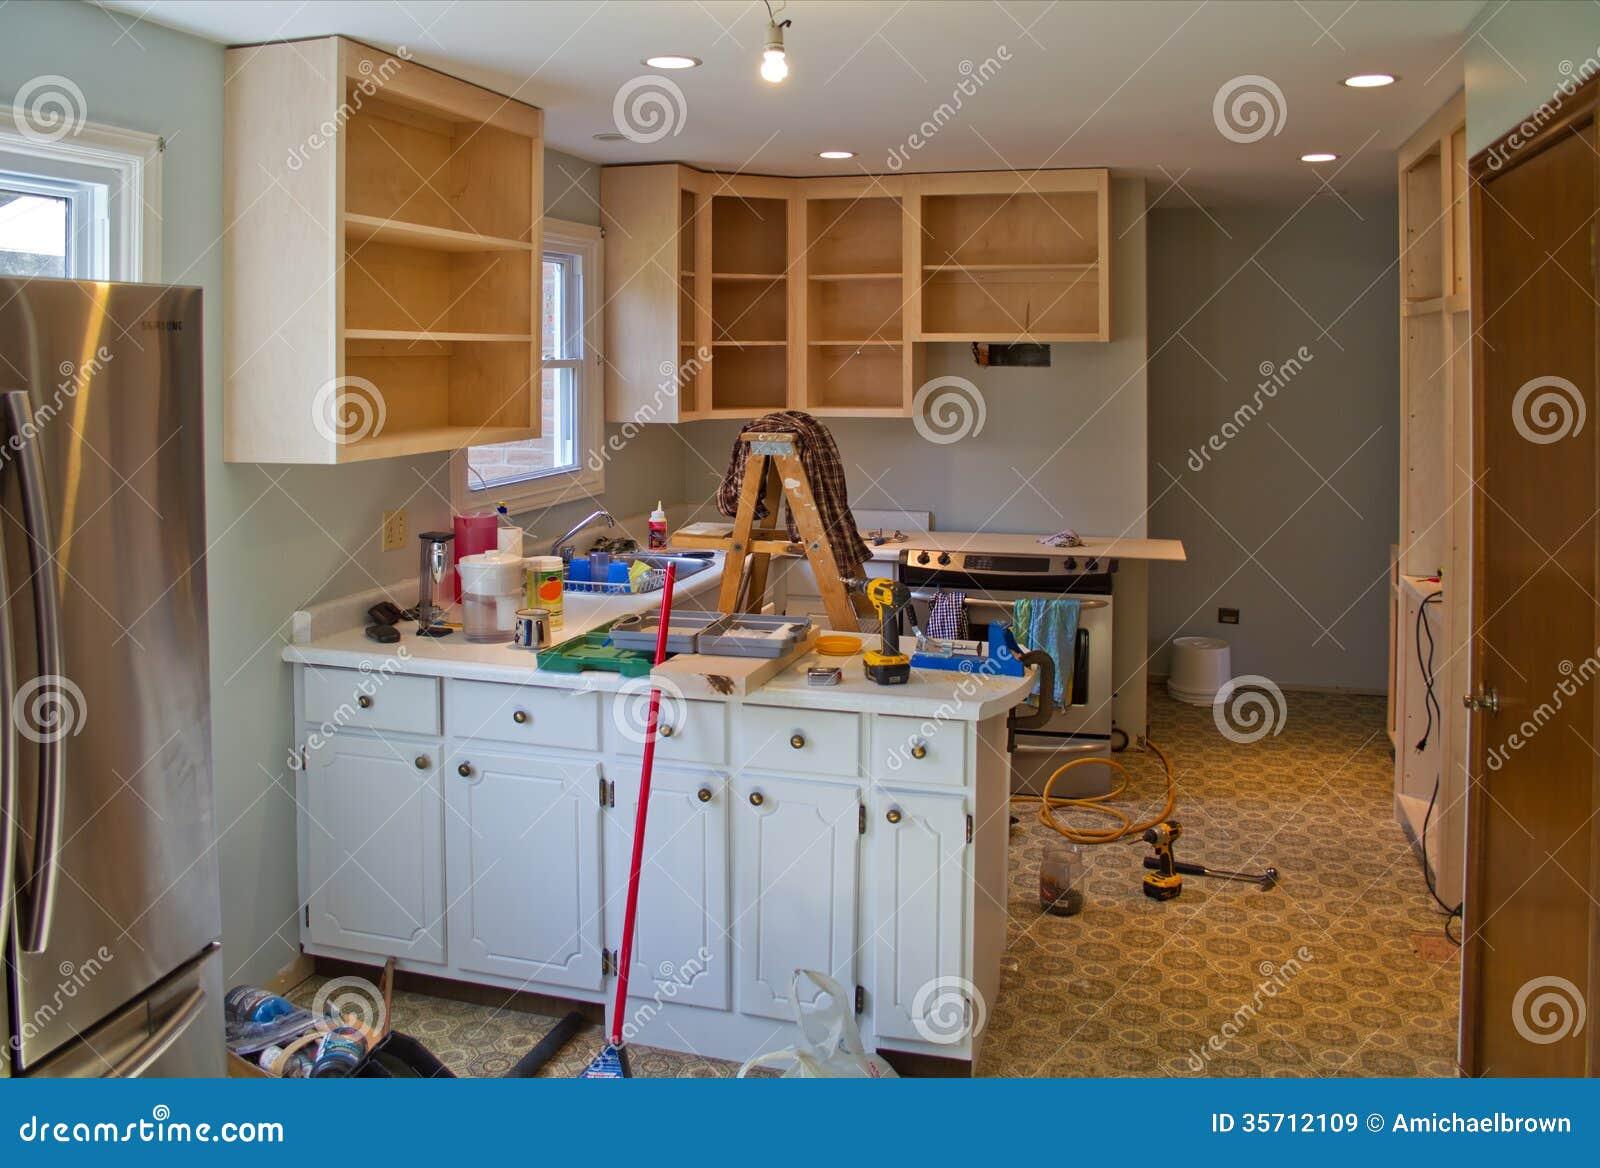 Kitchen Renovation In Progress Kitchen Renovation Royalty Free Stock Images  Image 35712109